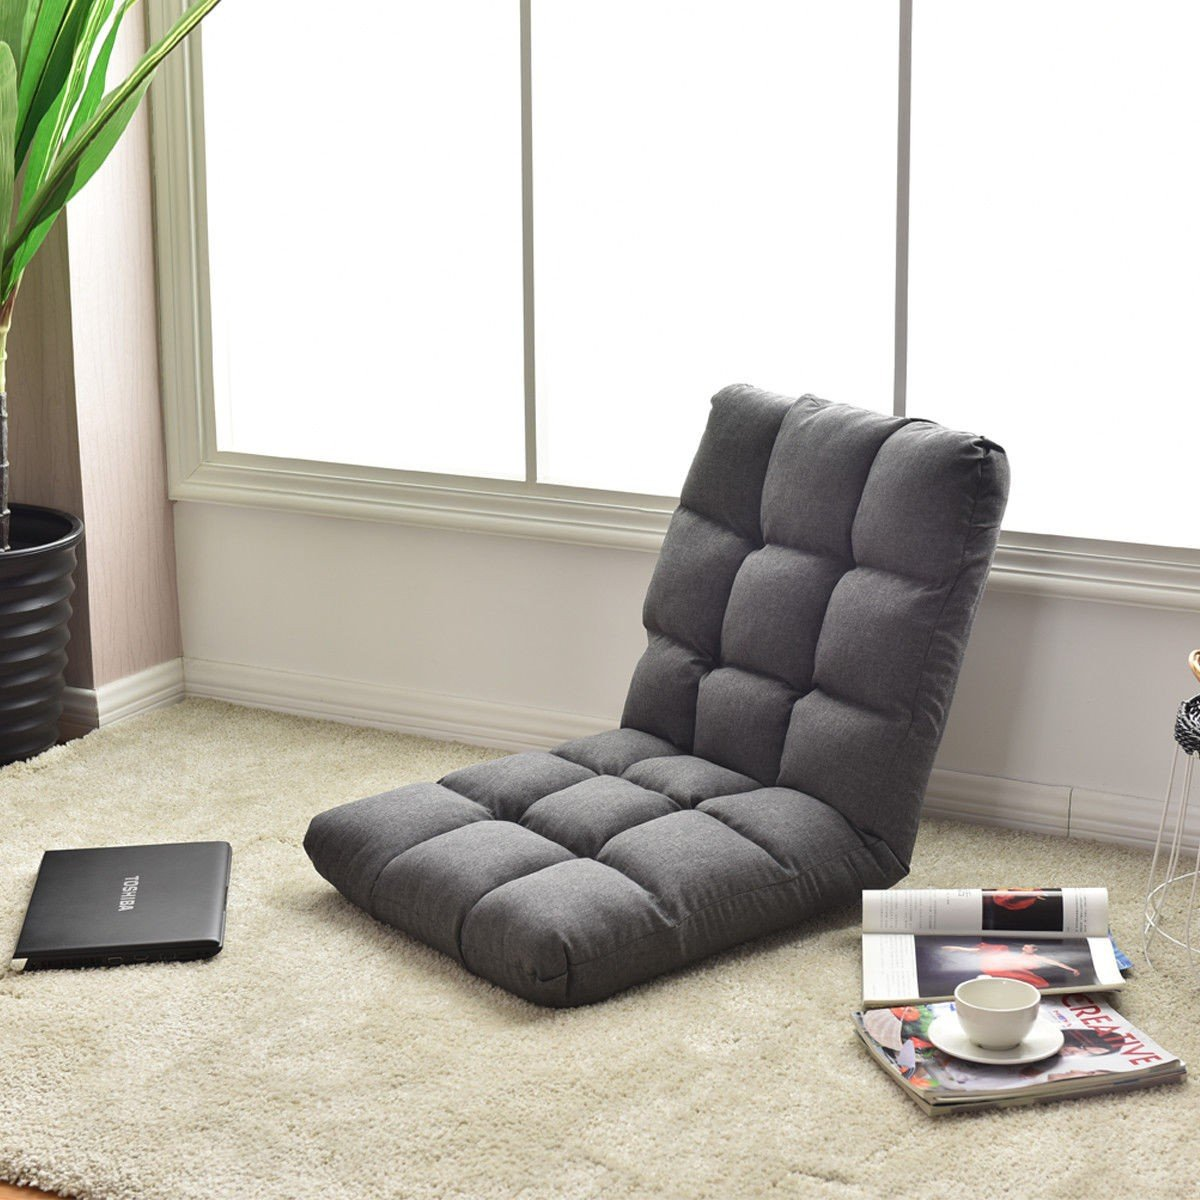 Wonderful 14 Position Adjustable Cushioned Floor Gaming Sofa Chair